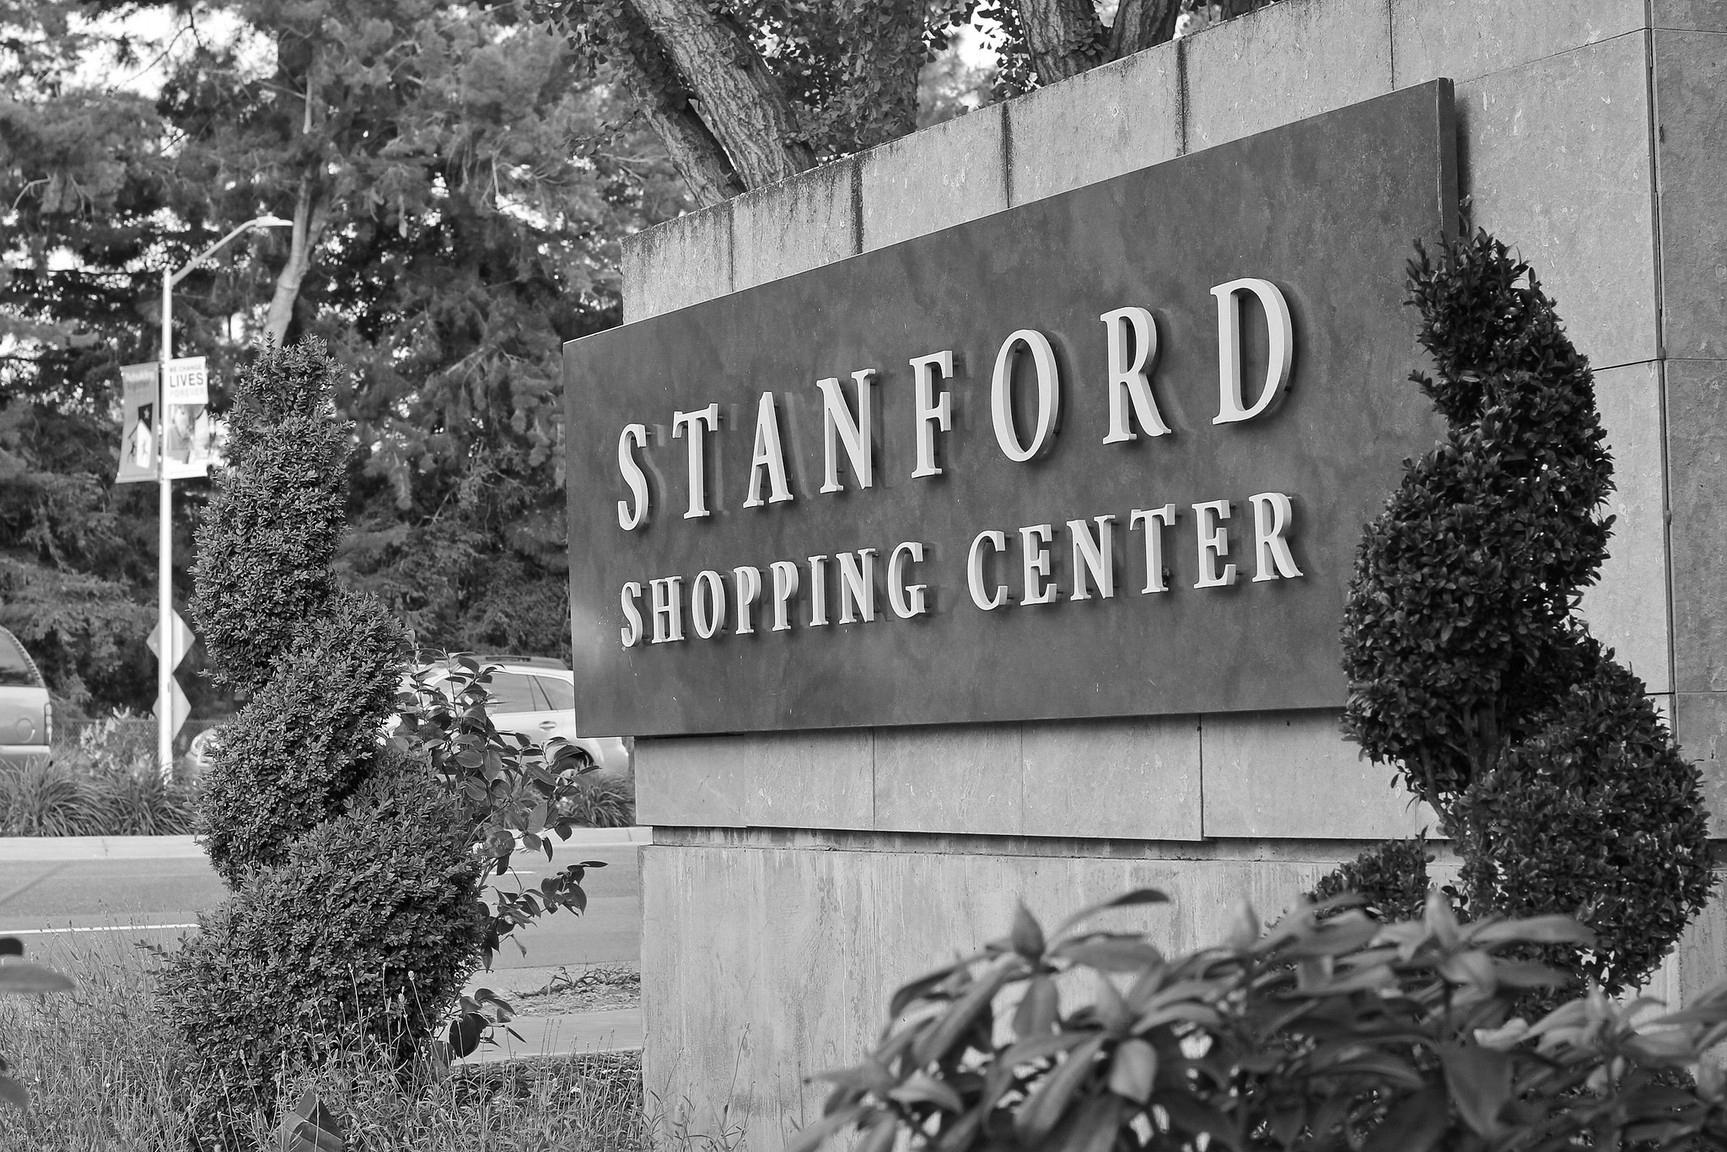 Stanford+Palo+Alto+Mall+Blu+Skye+Media-1796x1152.jpg